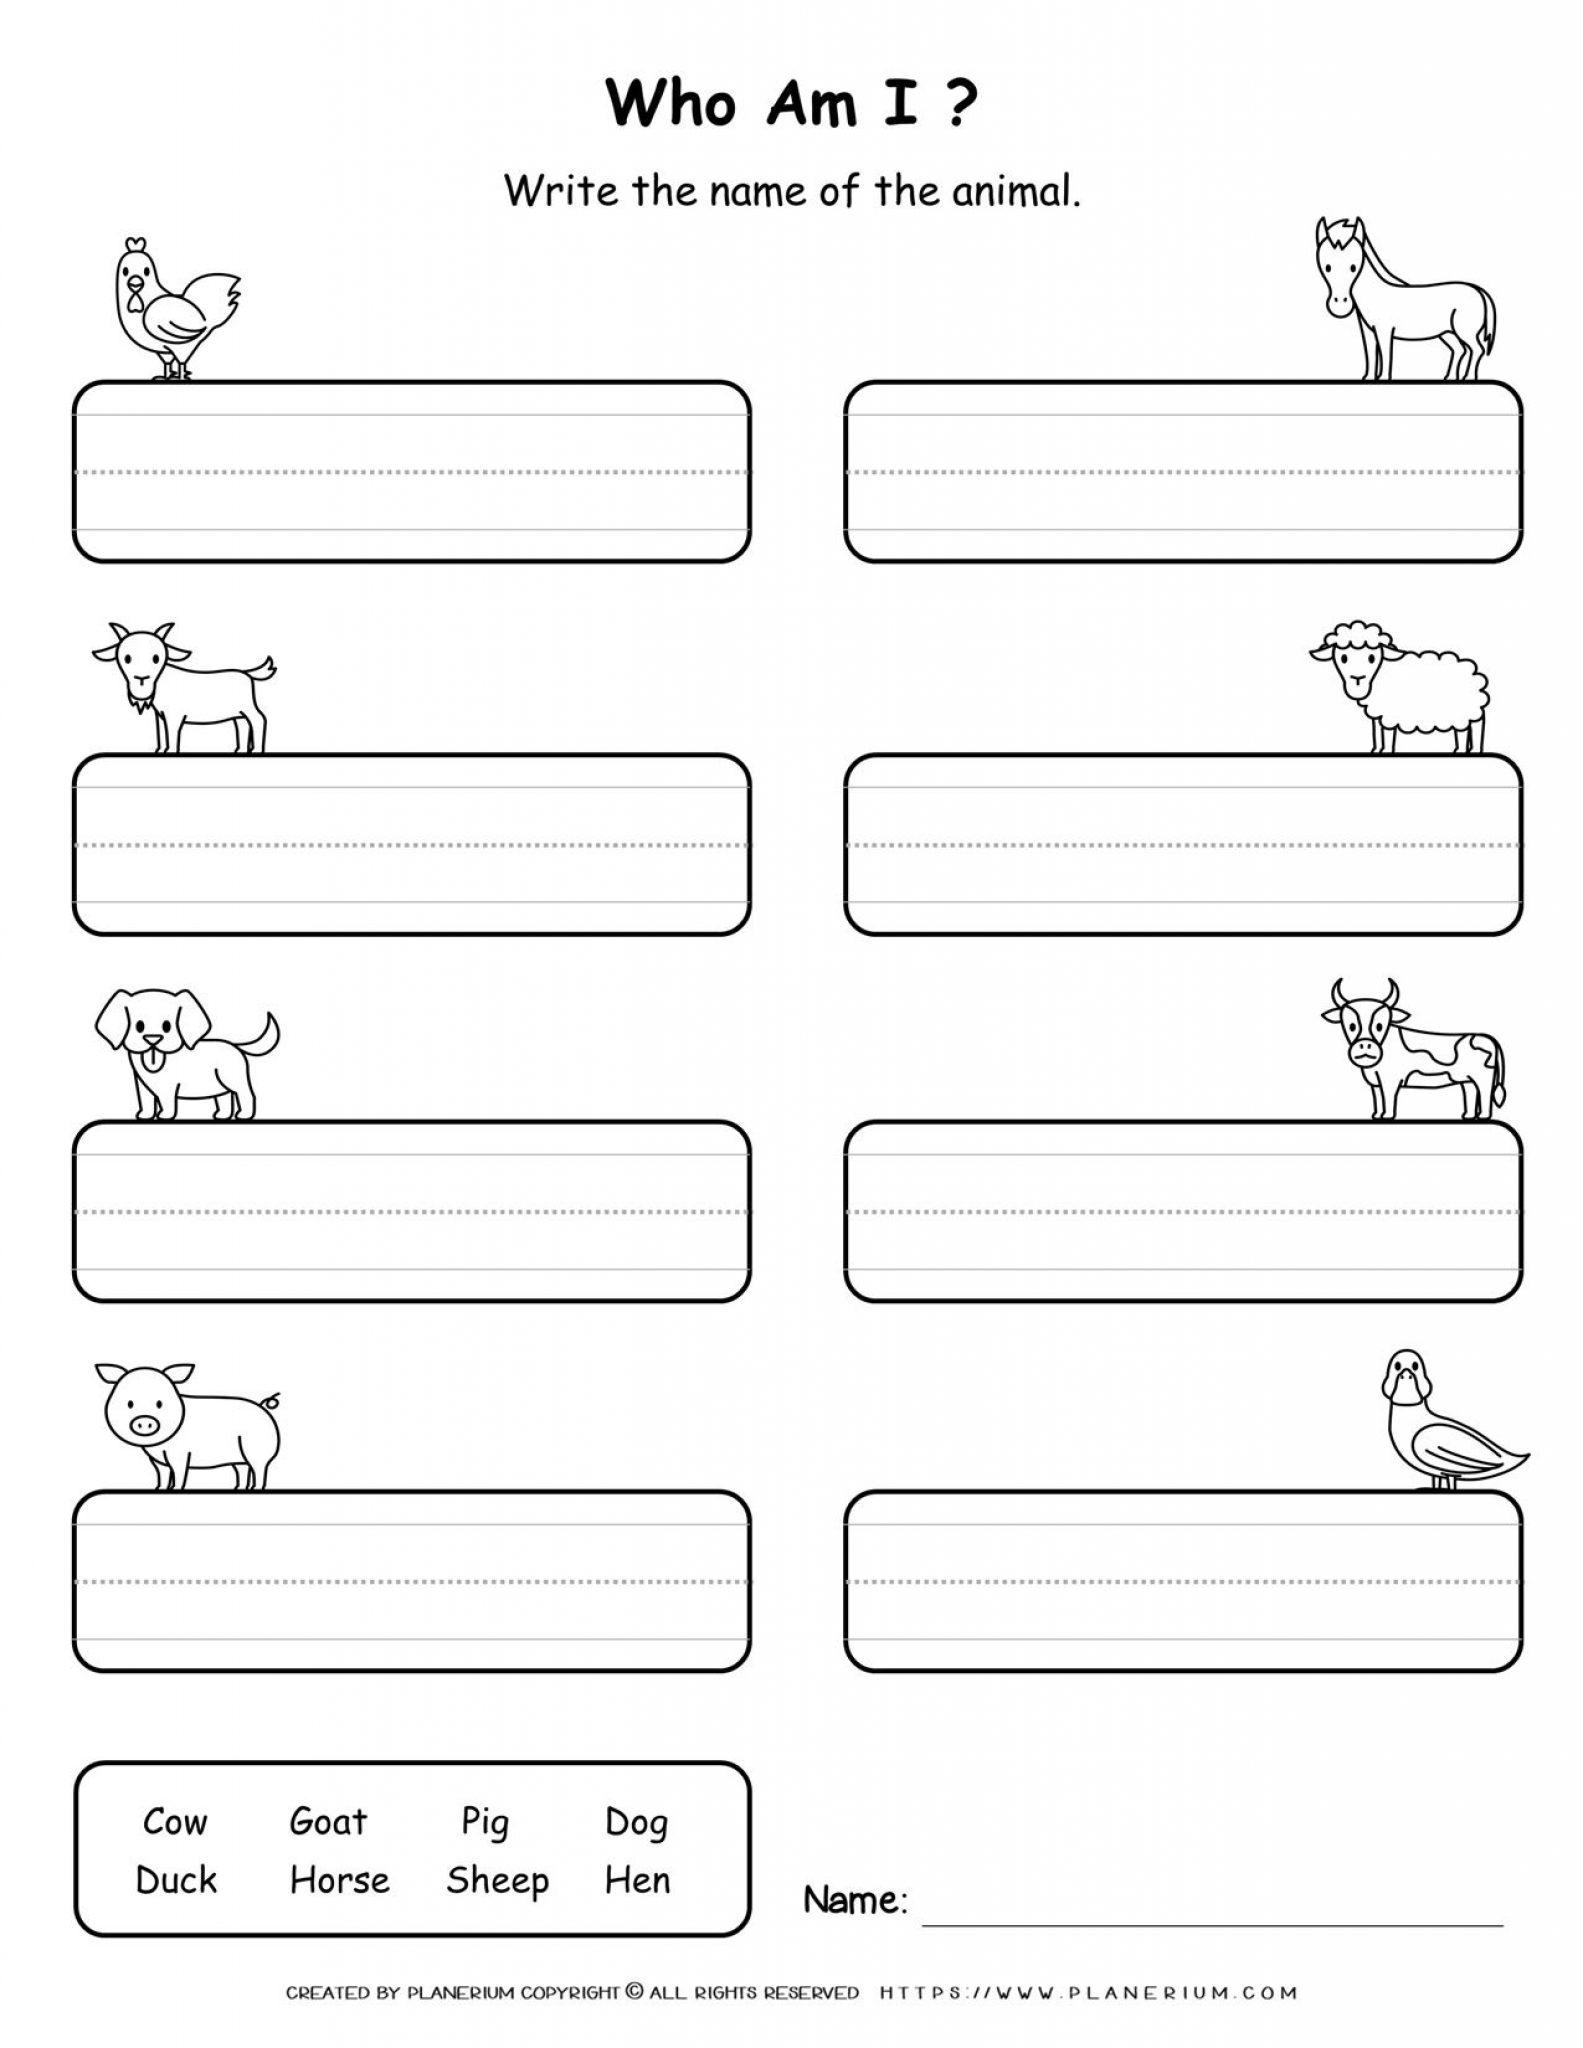 Farm Animals - Writing Names   Planerium